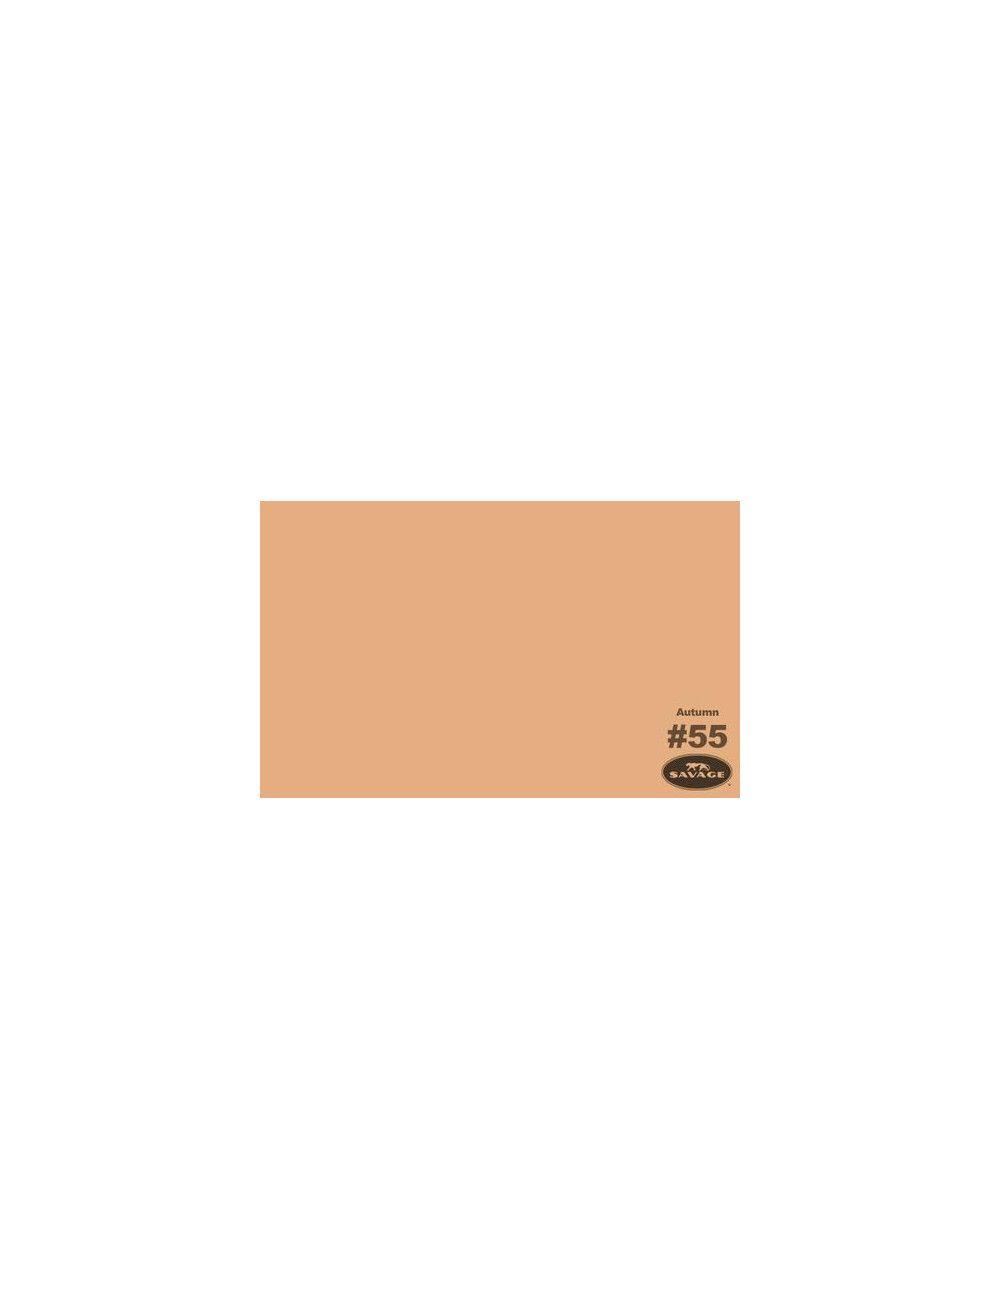 Manfrotto Pixi Negro - trípode Portatil